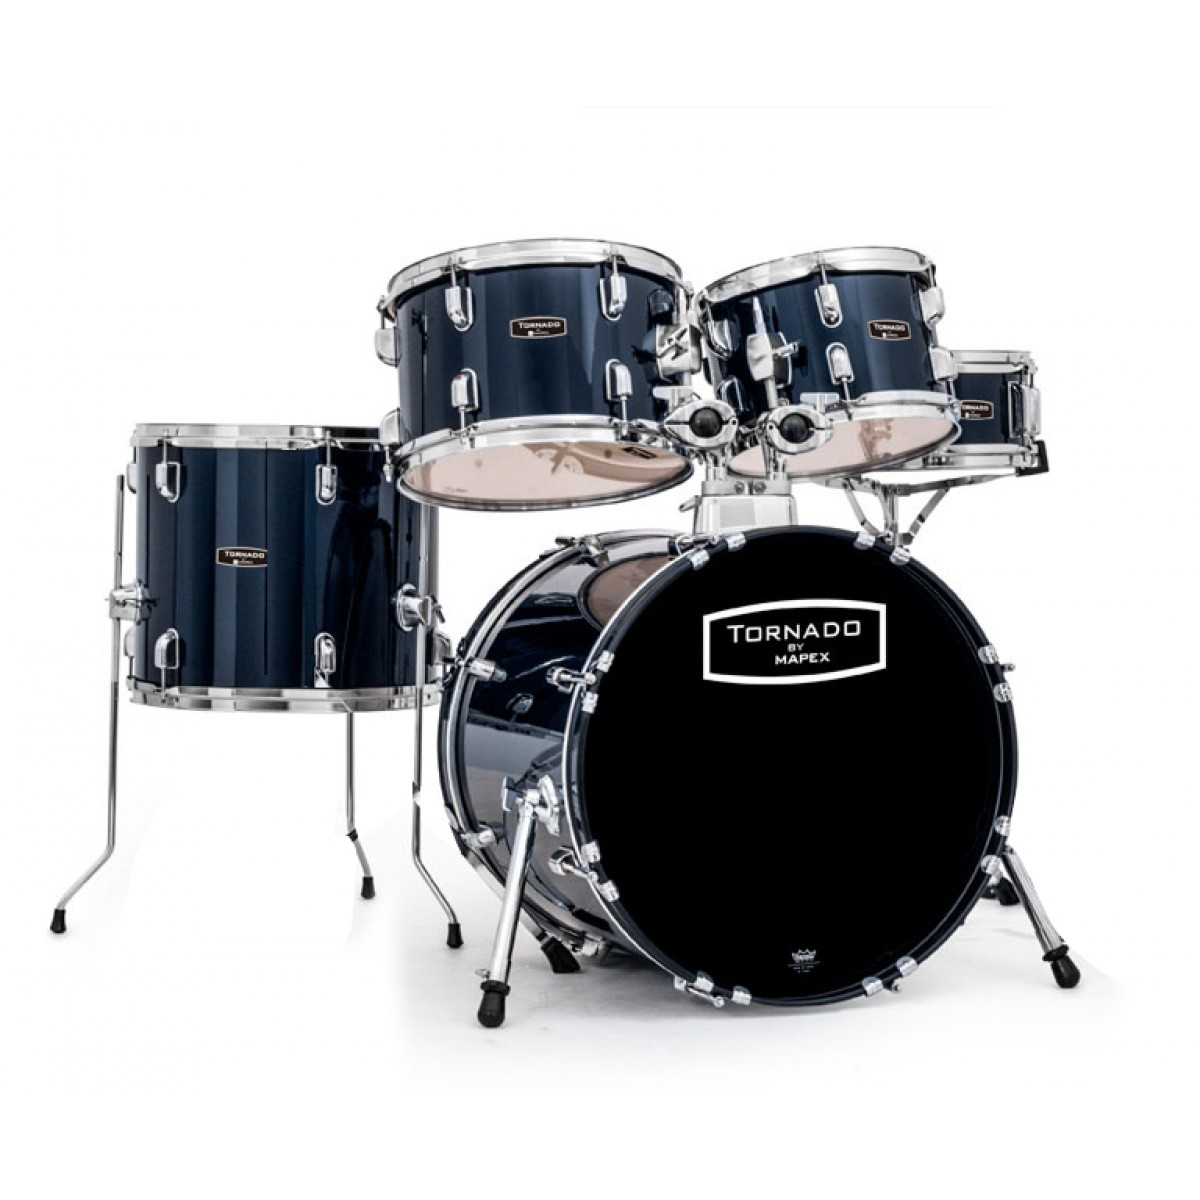 Tornado By Mapex Tnd5844ft Drum Set Acoustic Drum Kits